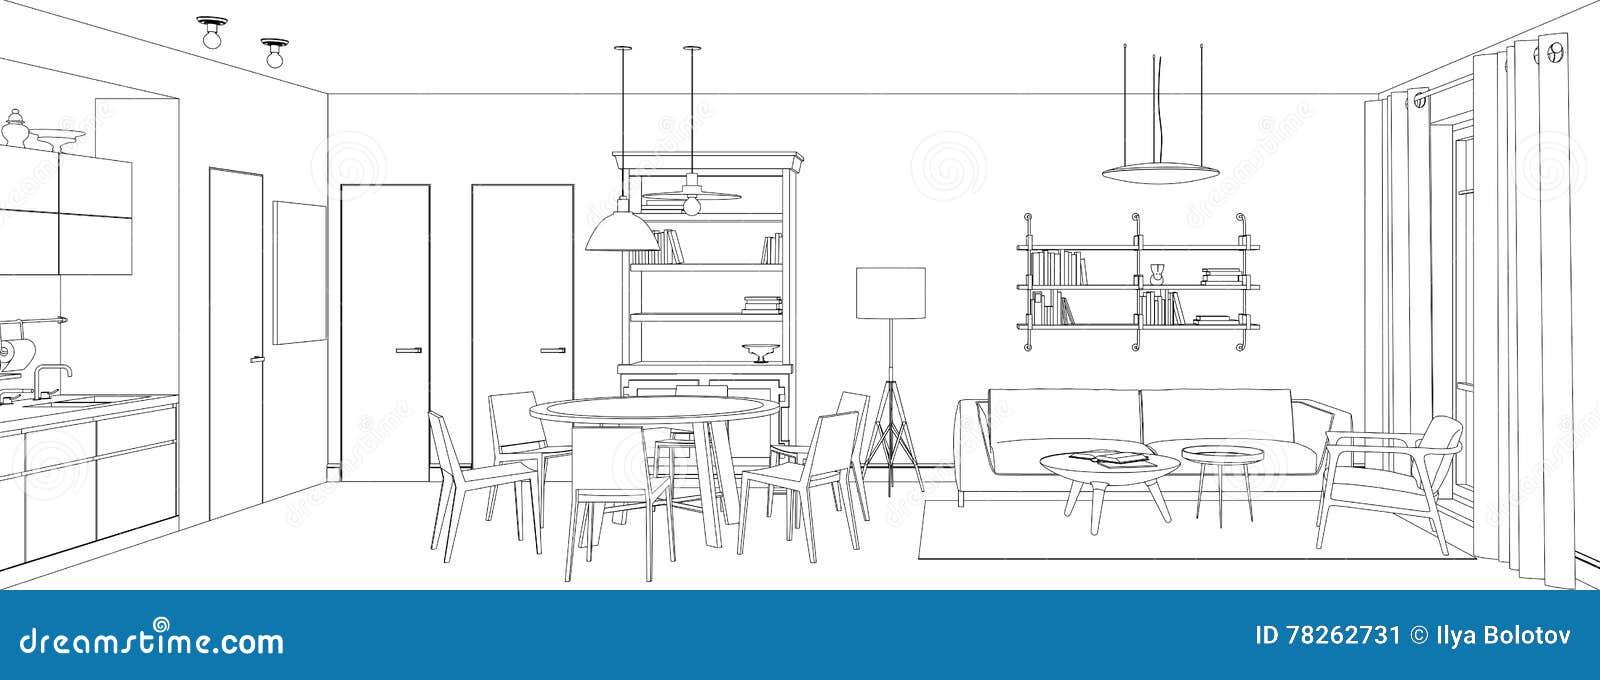 Dibujo lineal de la sala de estar ilustraci n del vector for Sala de estar dibujo